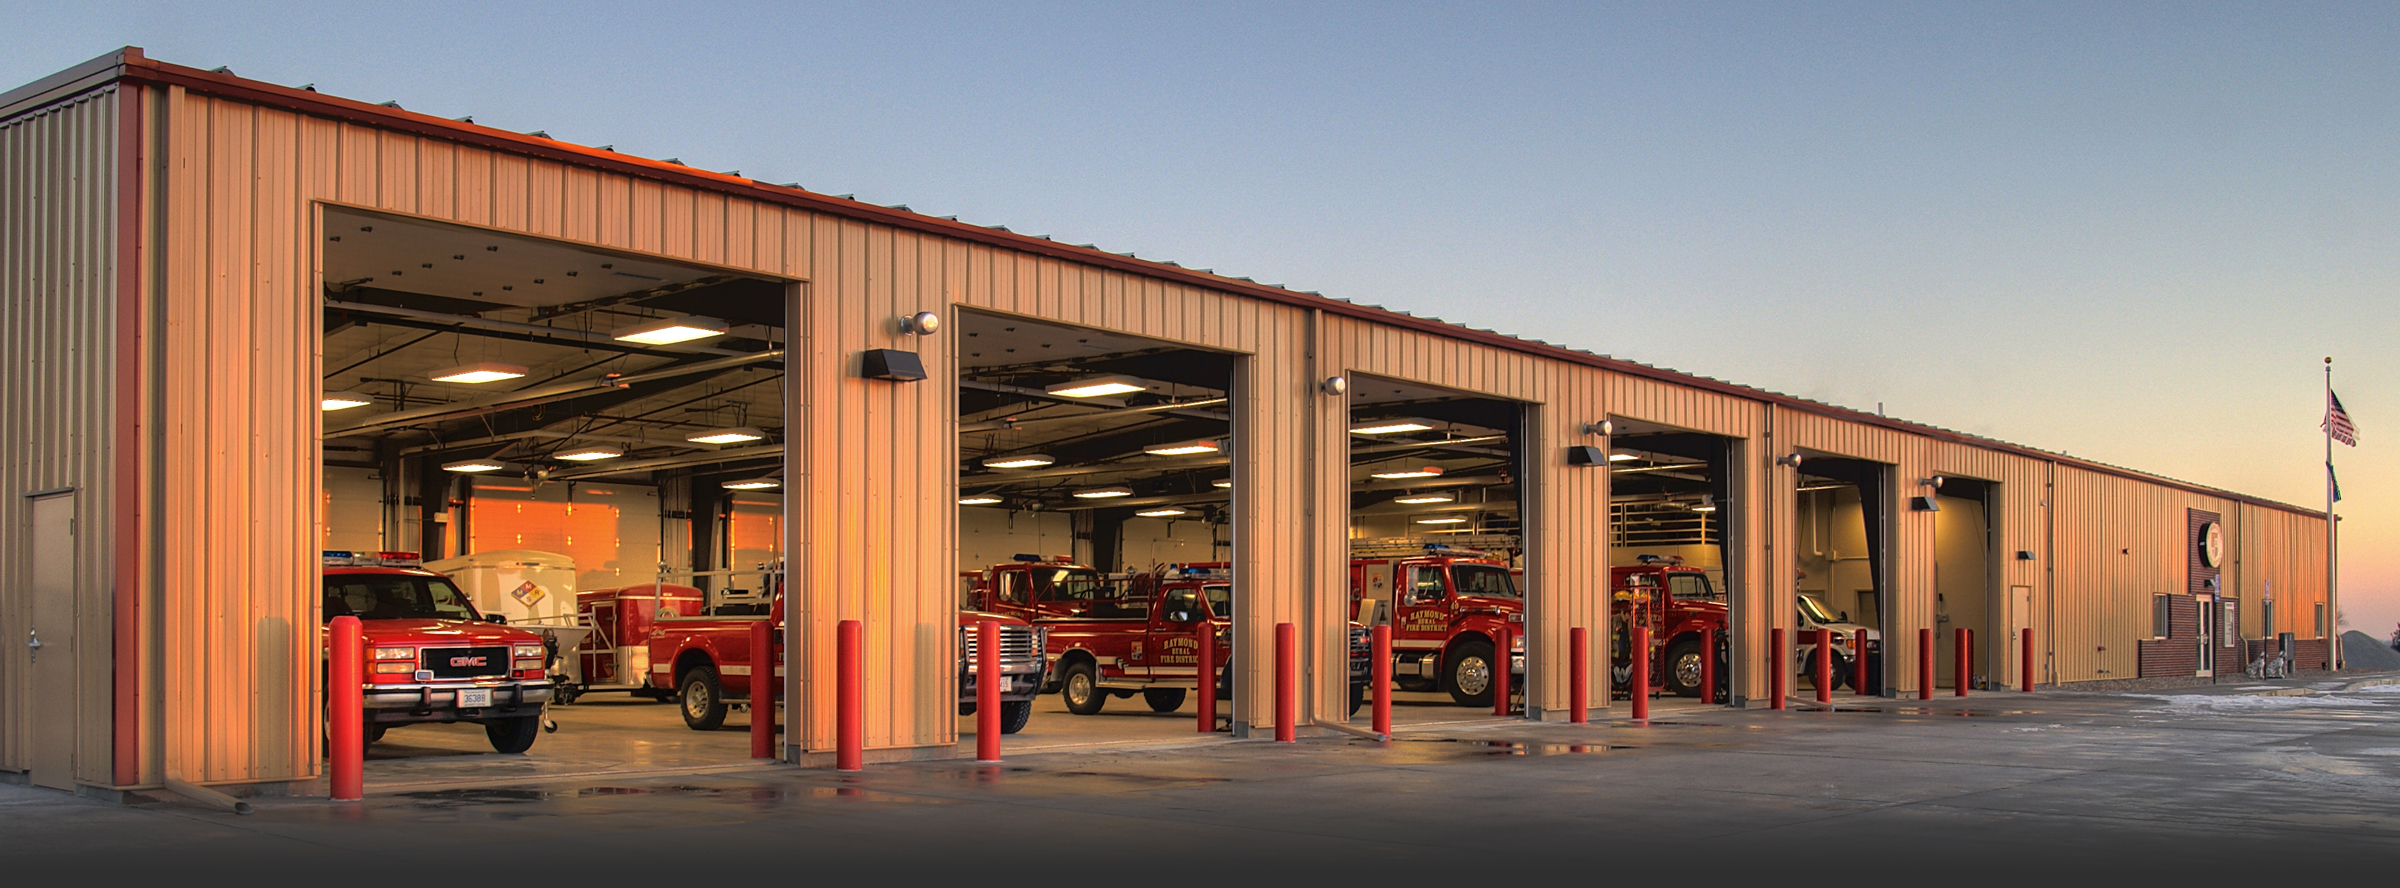 Raymond Fire & Rescue